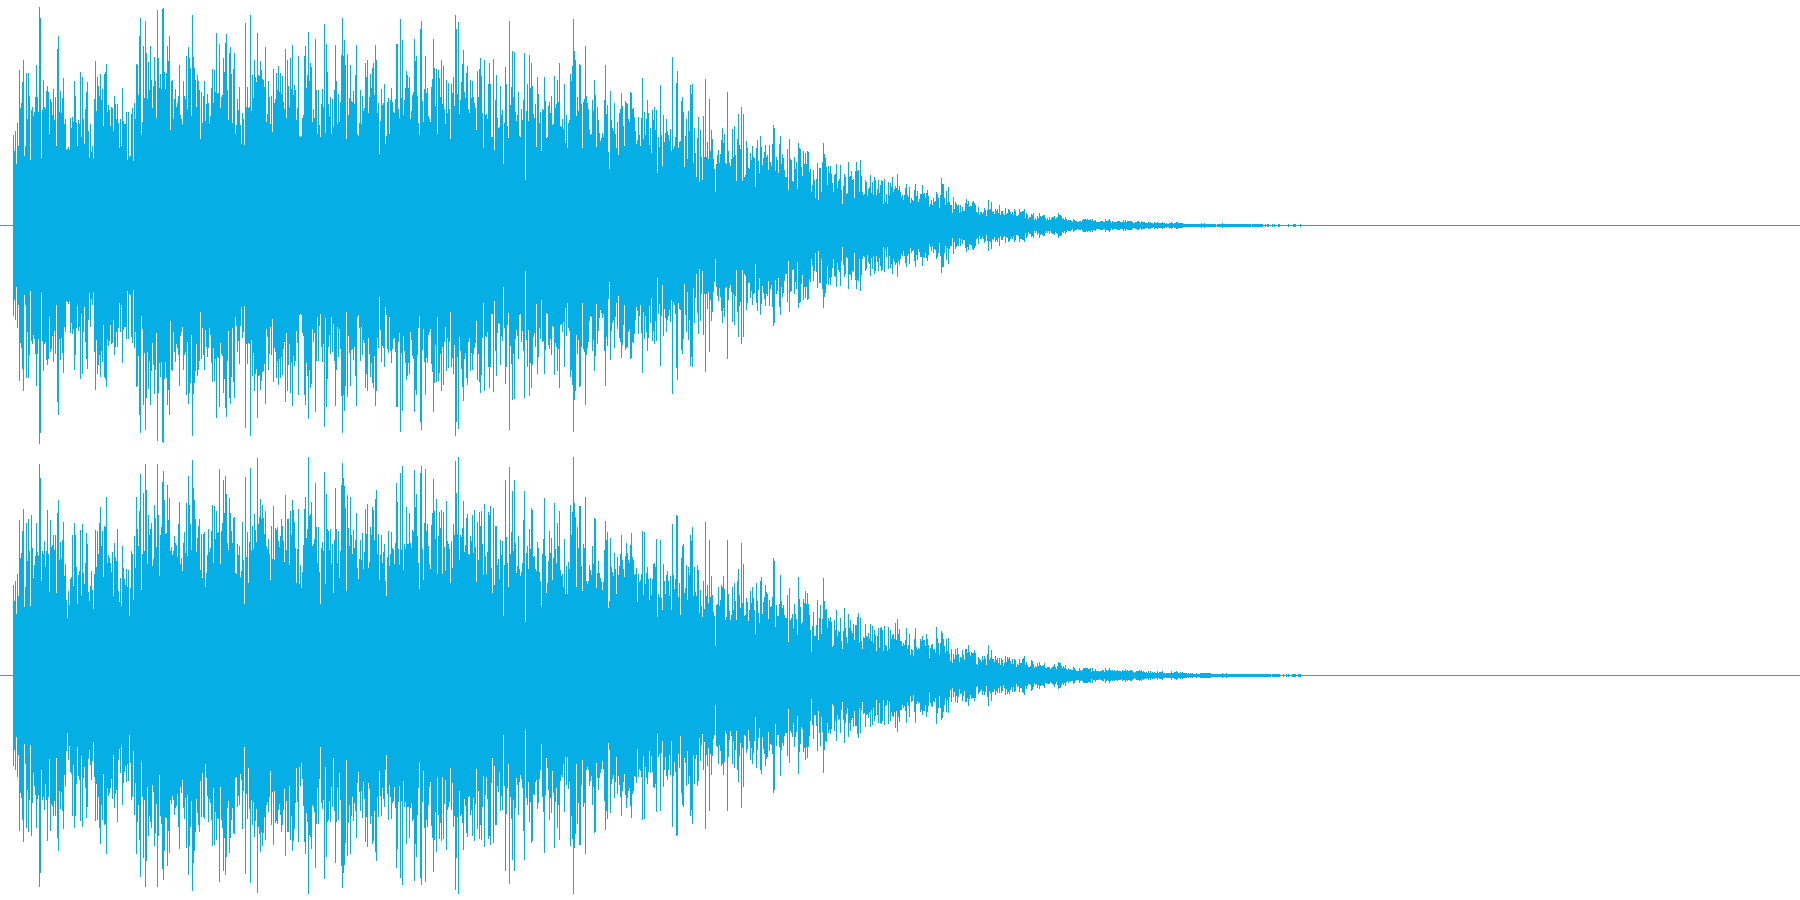 SFビームや魔法攻撃の発射音の再生済みの波形